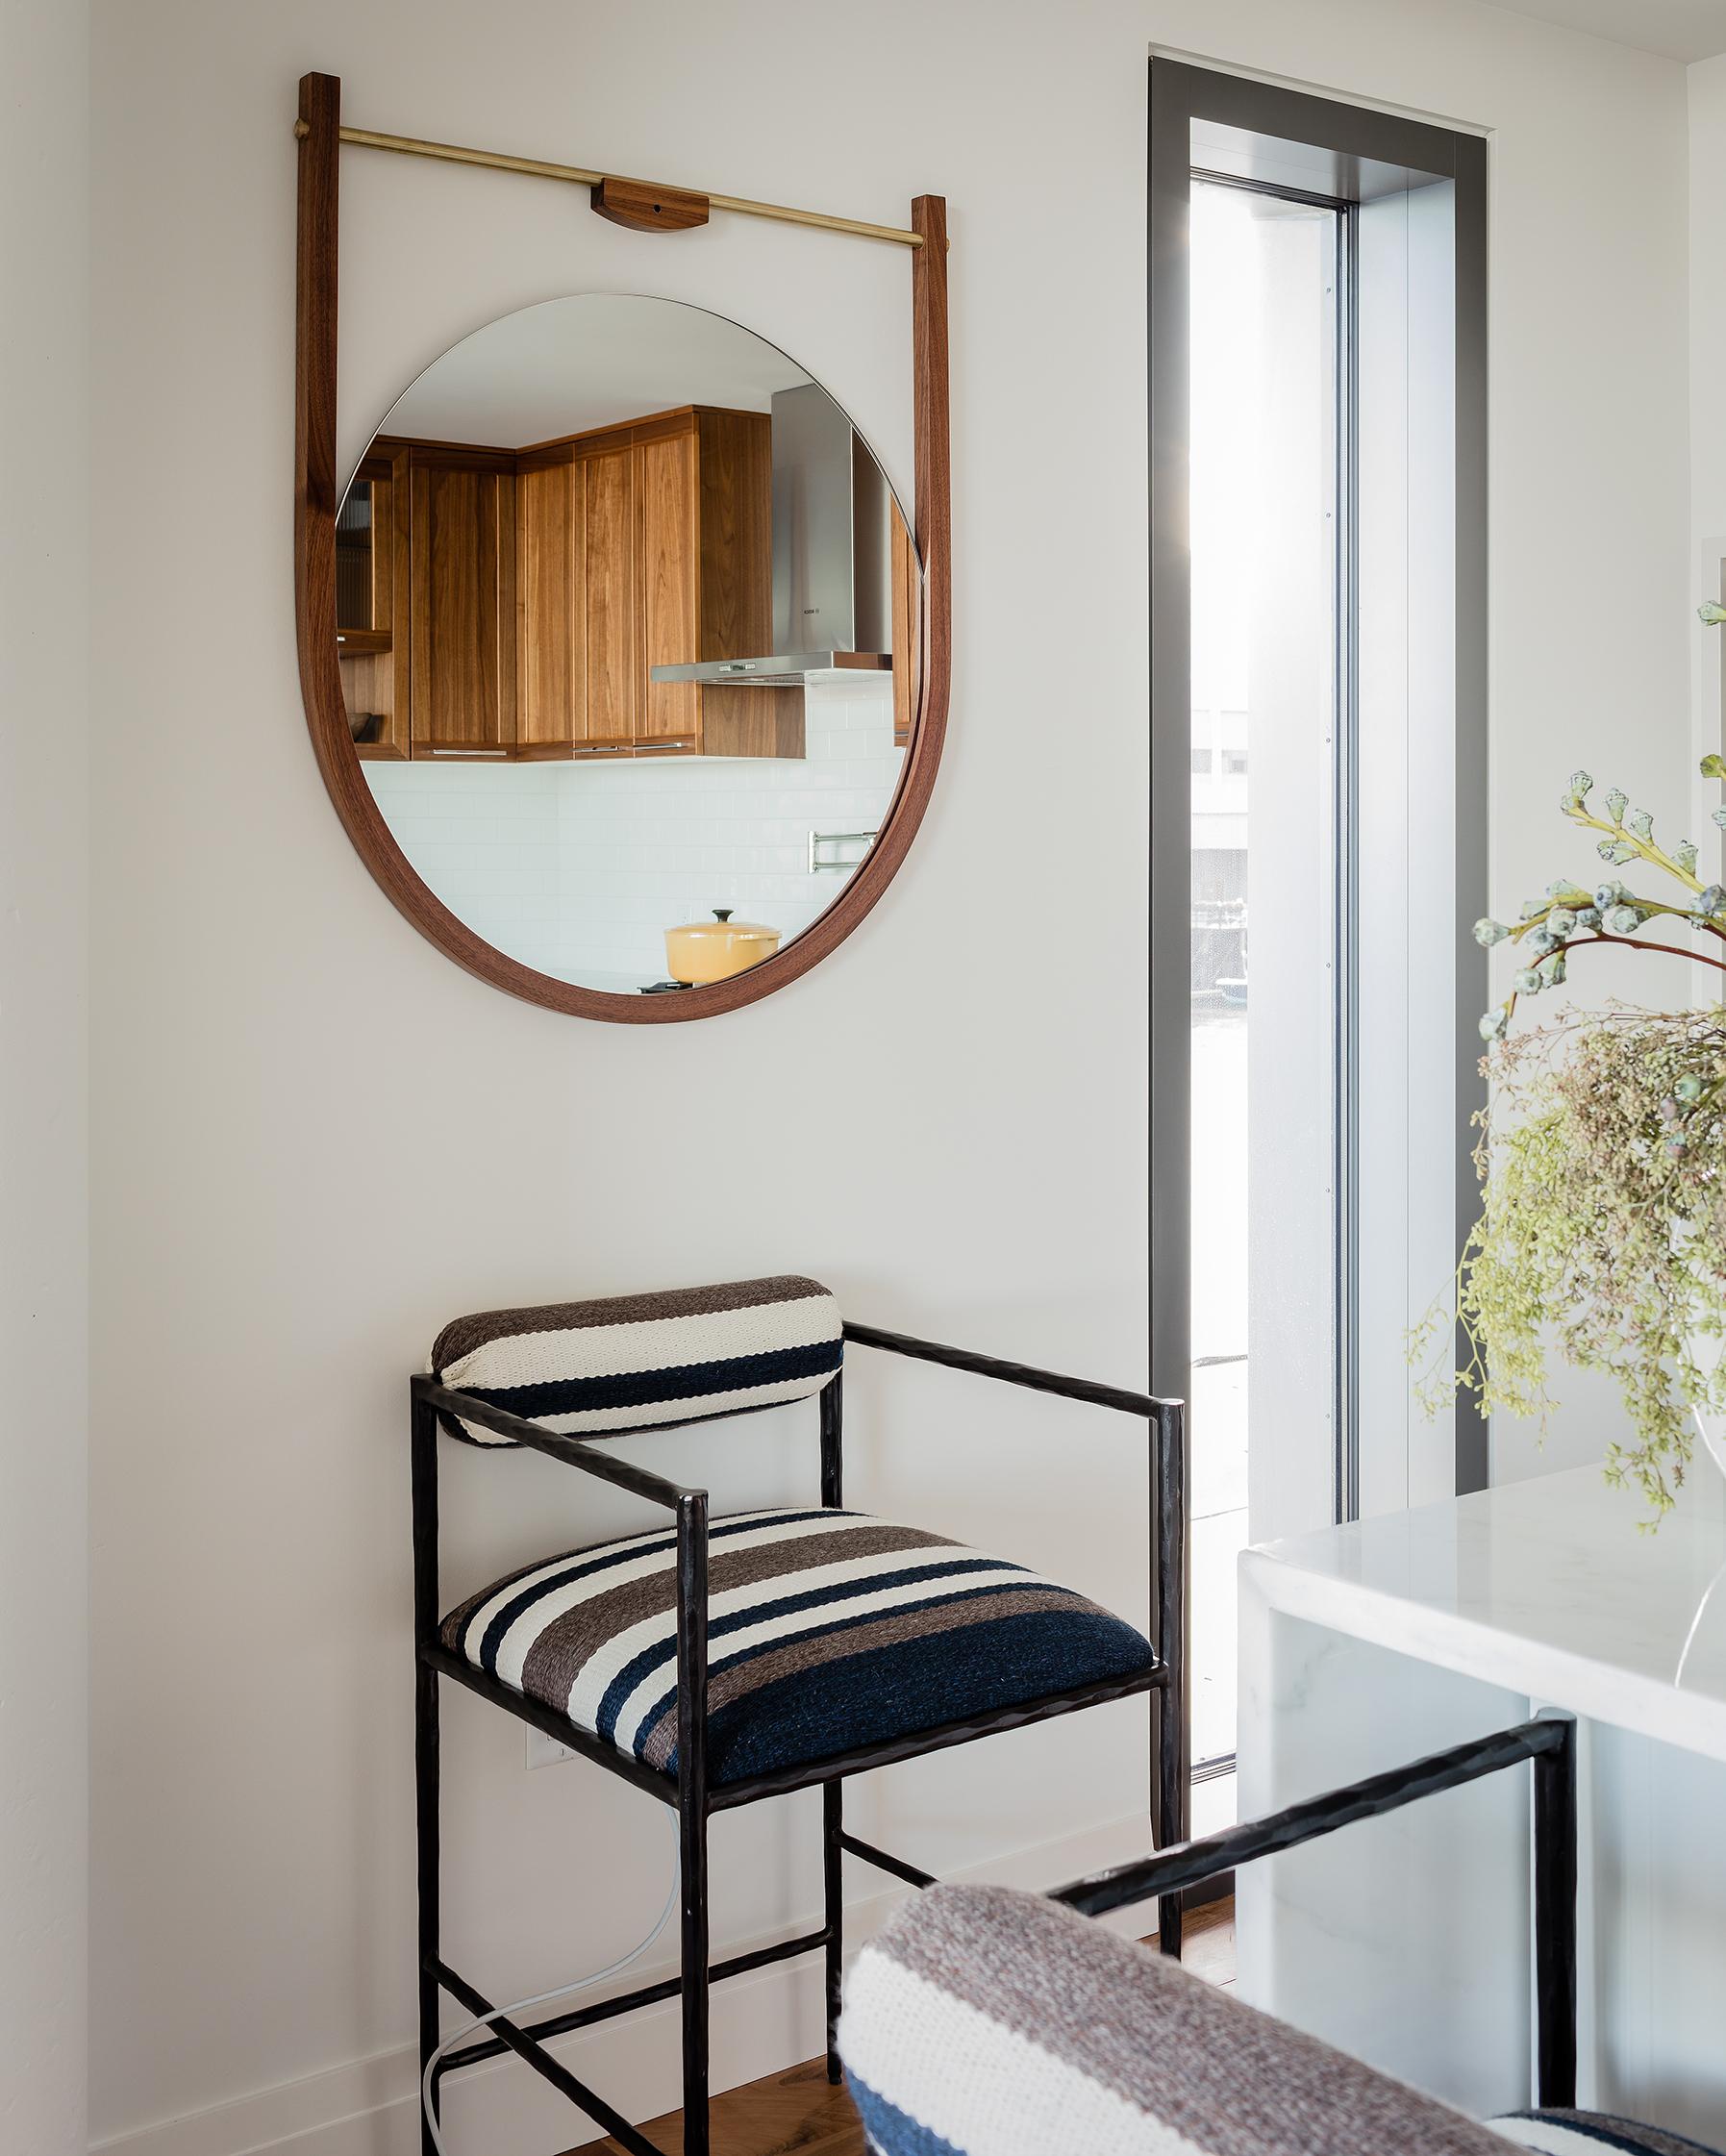 pier-4-model-kitchen-stool-hudson-interior-designs.jpg